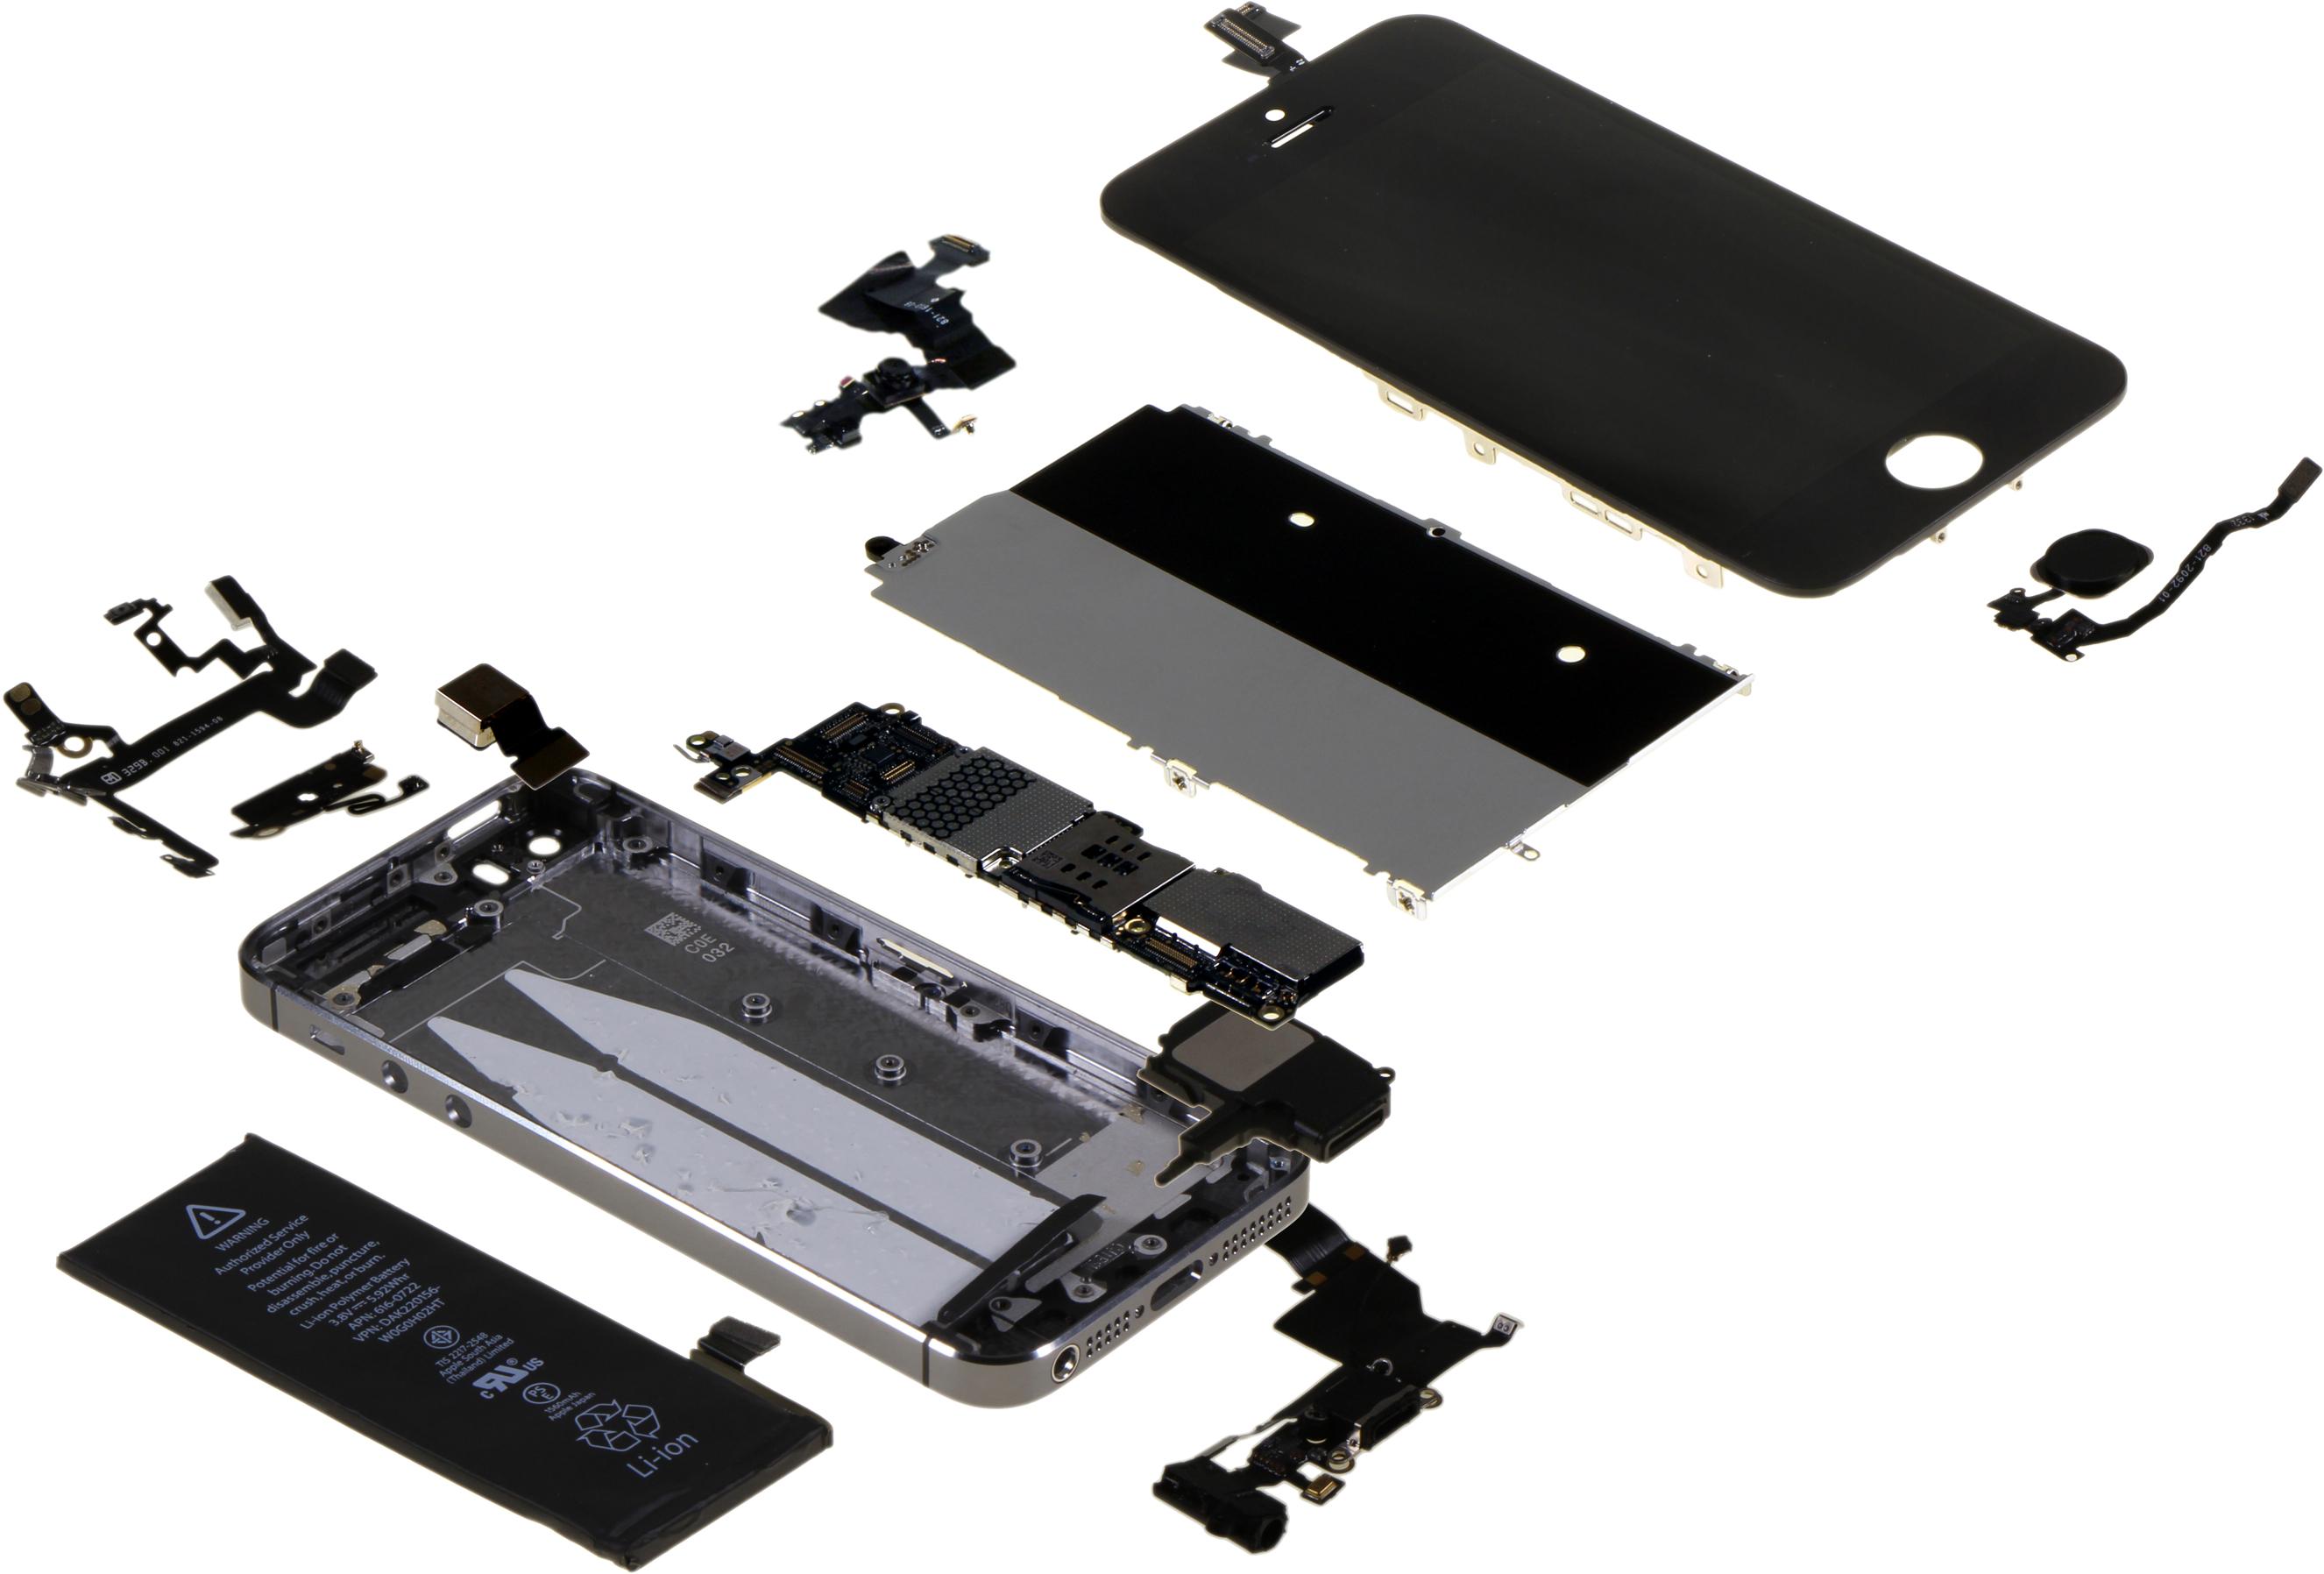 iPhone 5s desmontado pela IHS